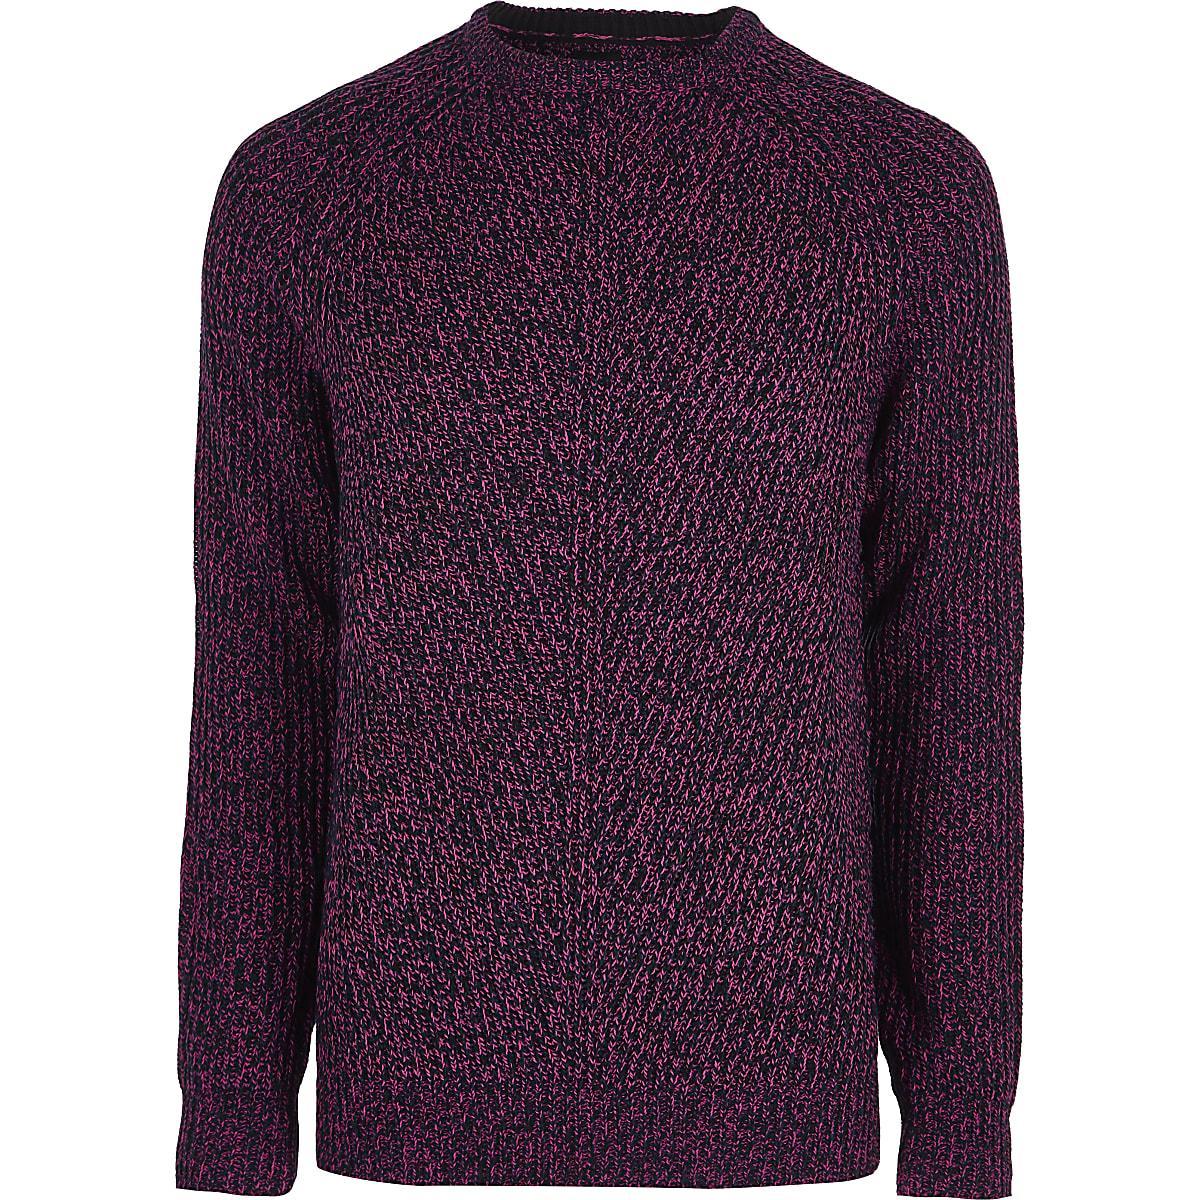 Pink textured crew neck sweater